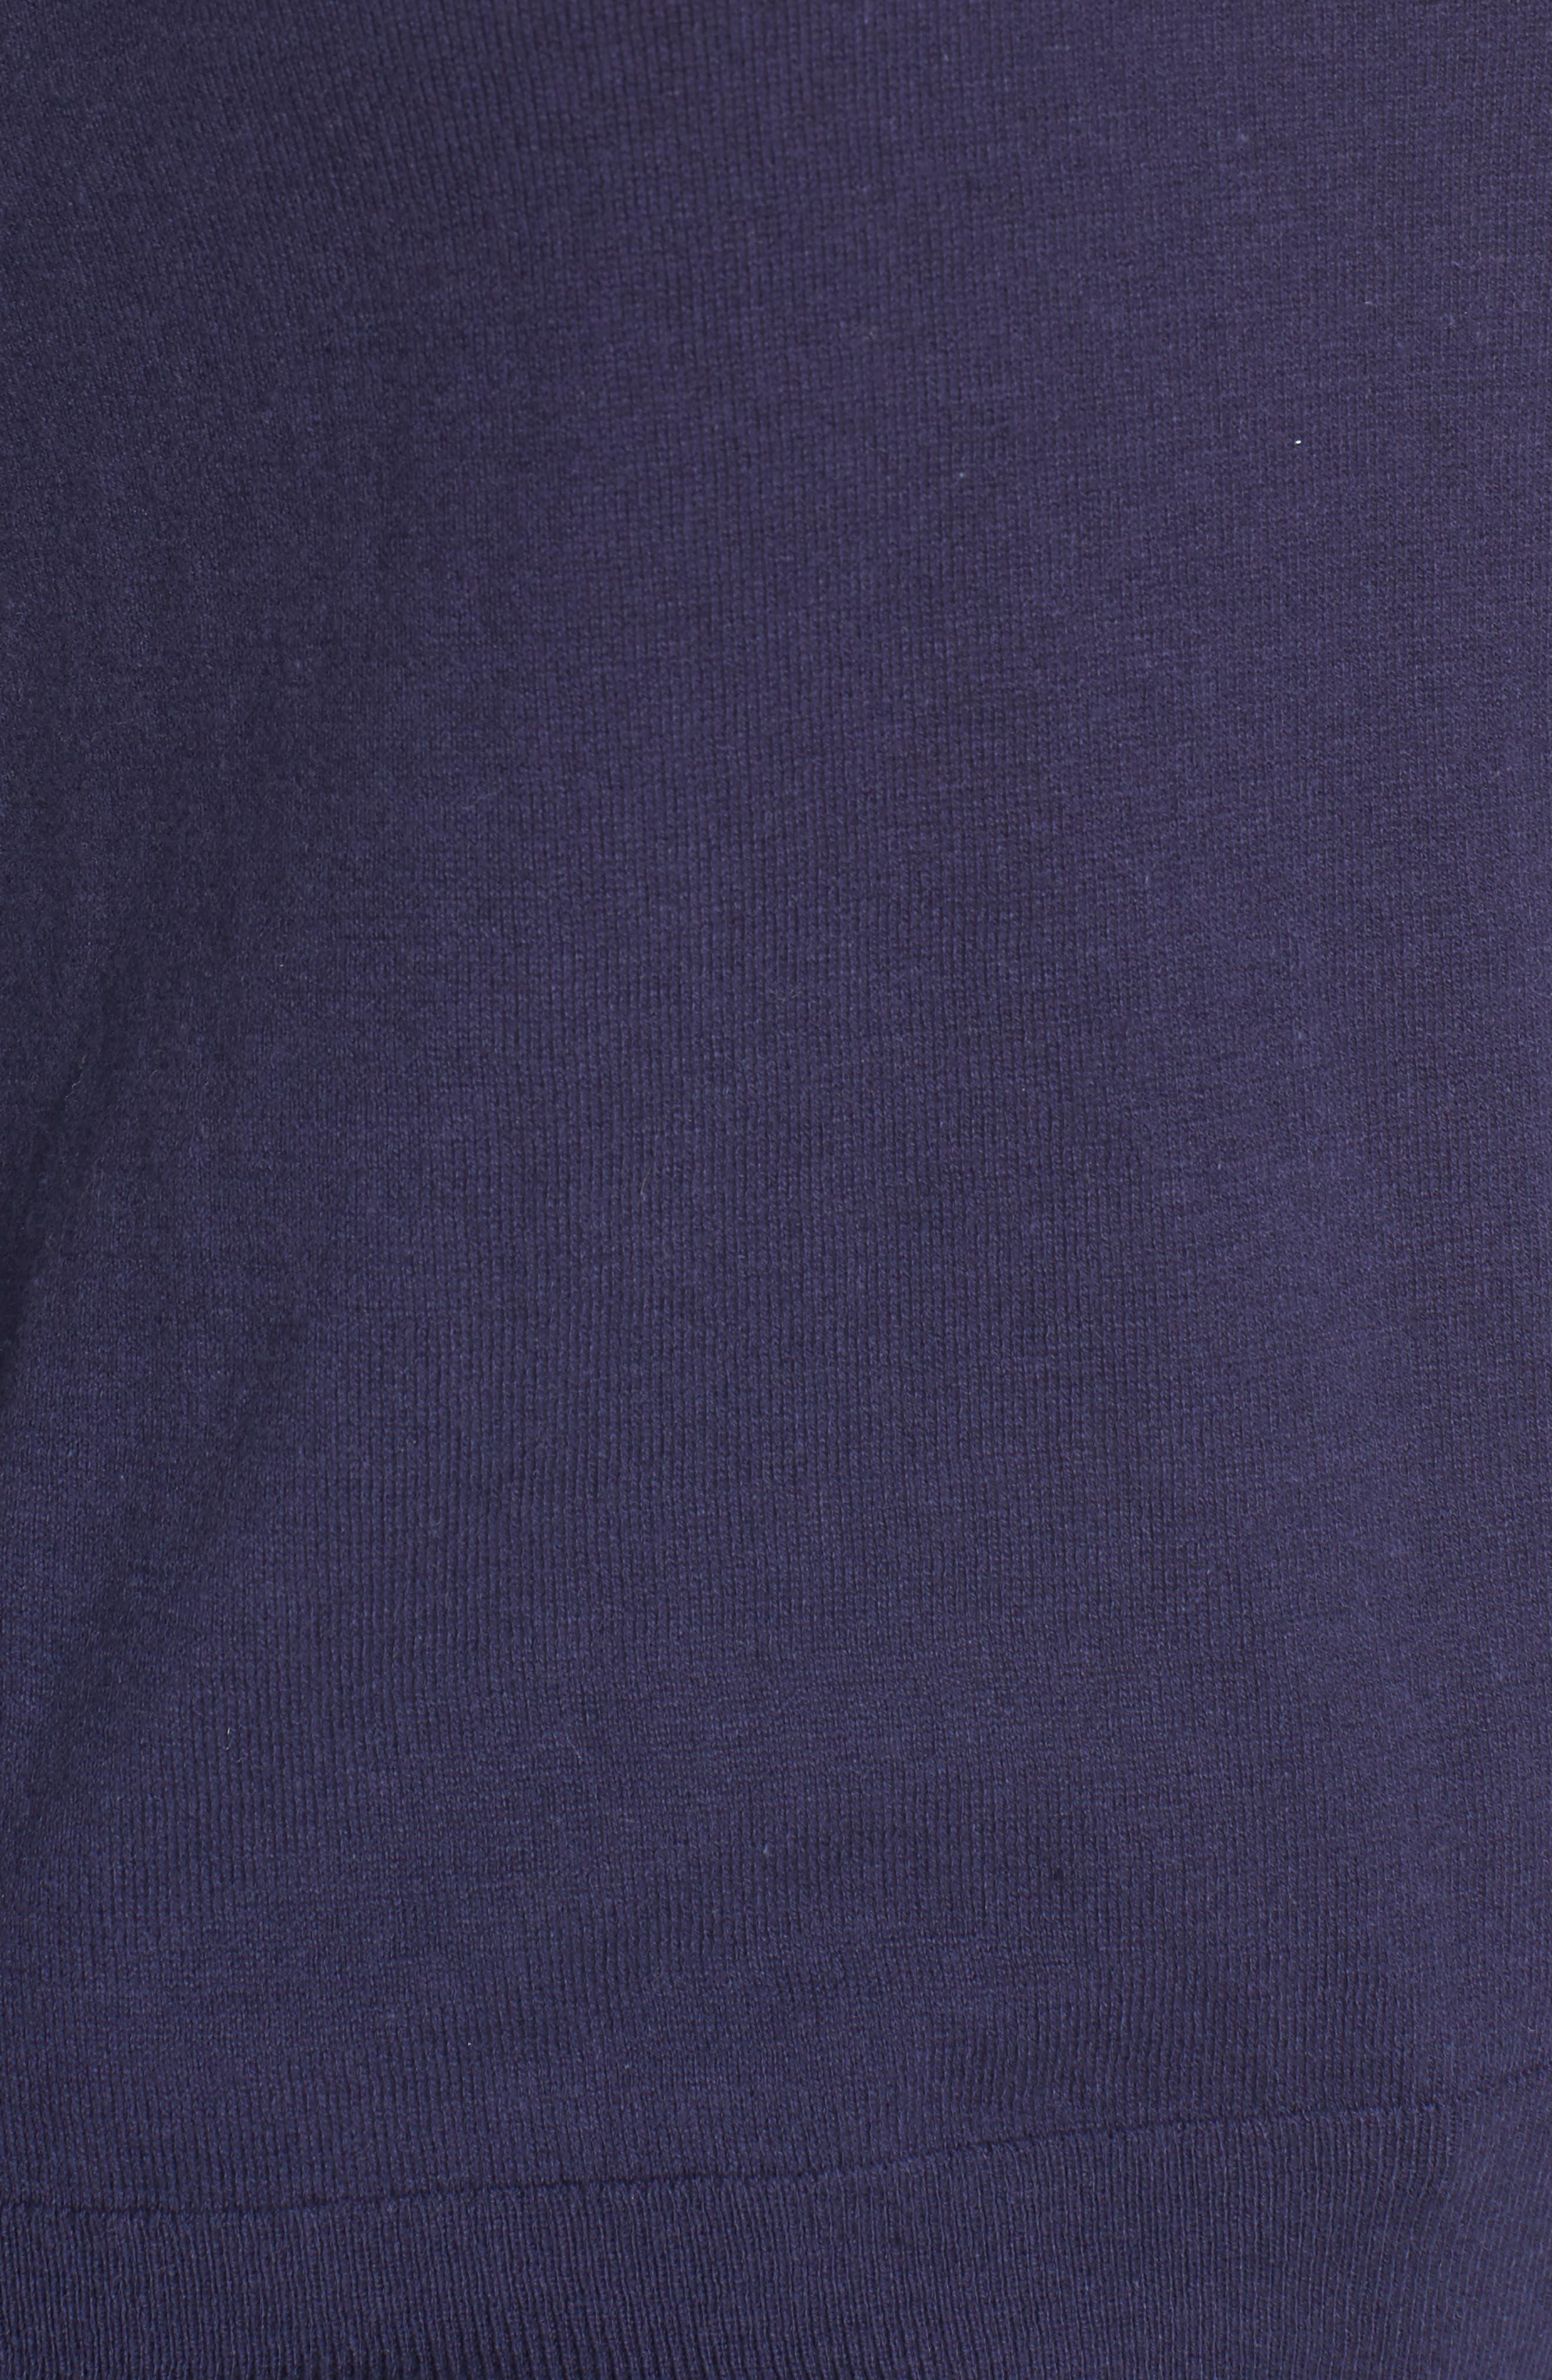 Ruffle Bell Cuff Sweater,                             Alternate thumbnail 5, color,                             Navy Dusk